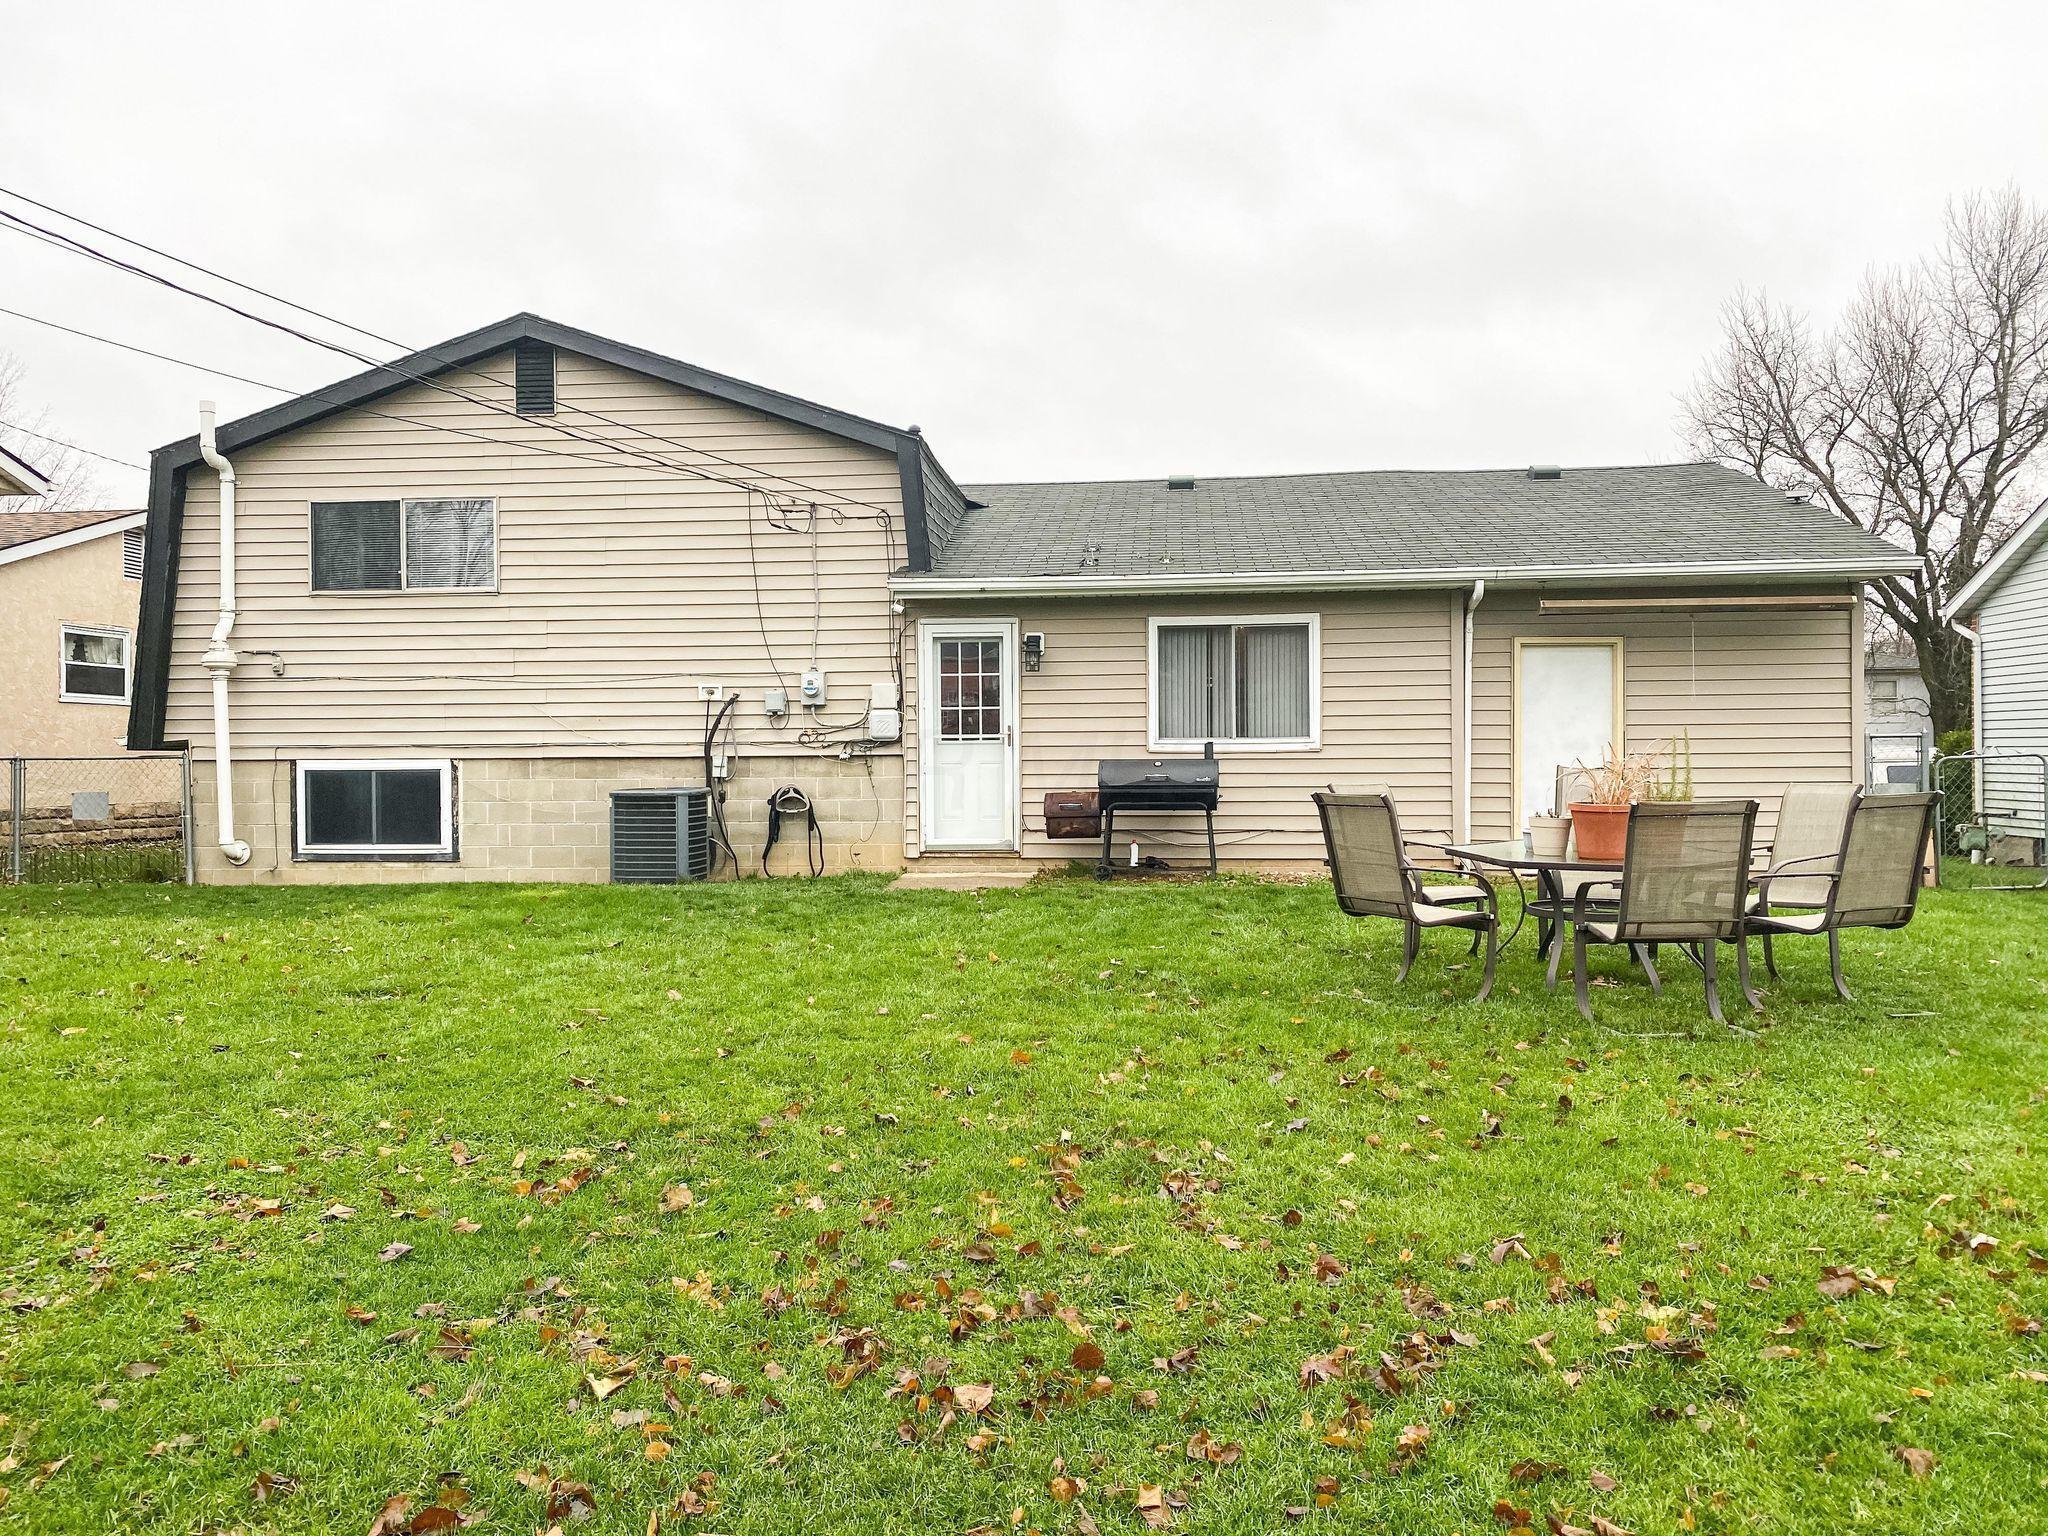 239 Fairway Road, Delaware, Ohio 43015, 4 Bedrooms Bedrooms, ,2 BathroomsBathrooms,Residential,For Sale,Fairway,220041144